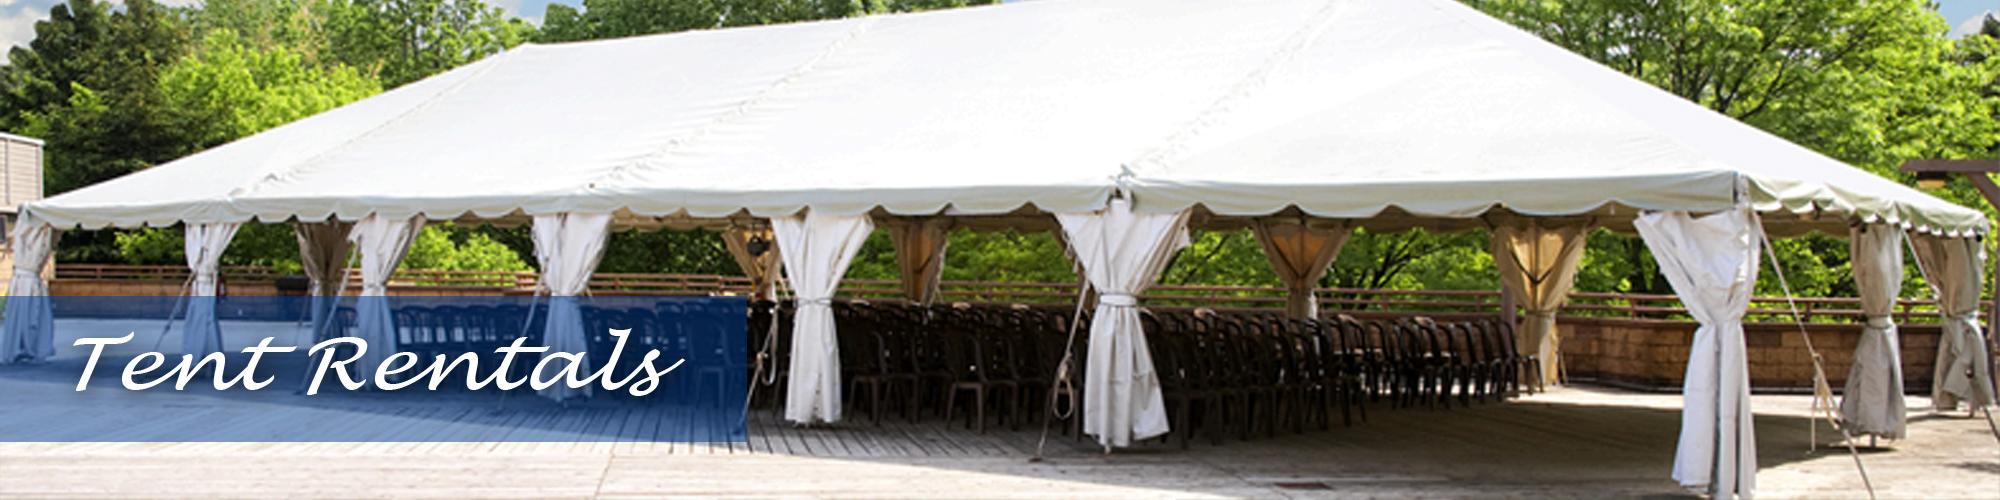 Tent Rentals Fort Walton Beach